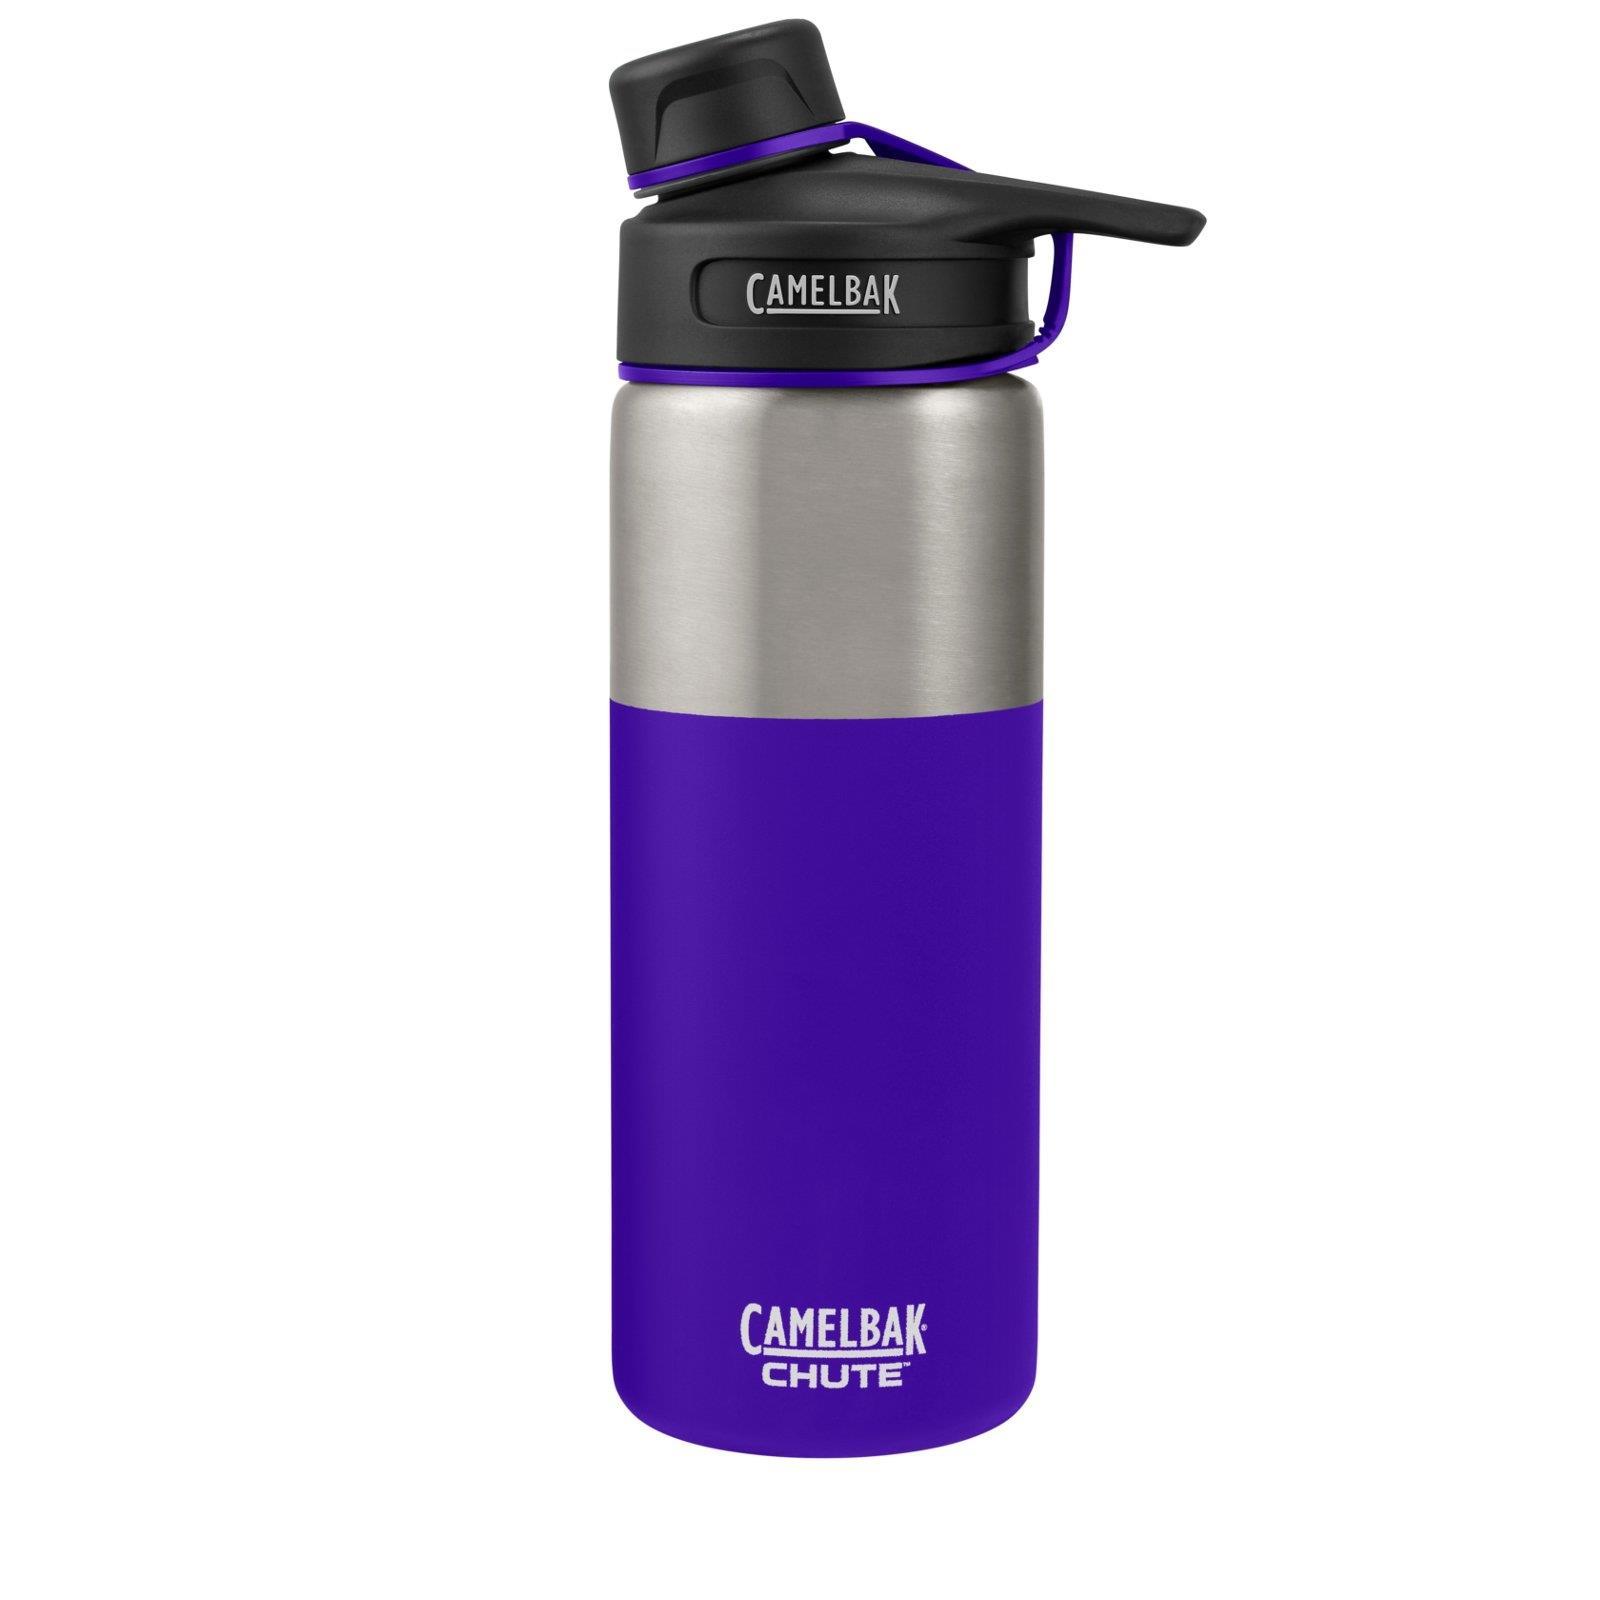 Camelbak-Trink-Isolier-Flasche-Chute-Vacuum-Thermo-Becher-Kanne-Outdoor Indexbild 24